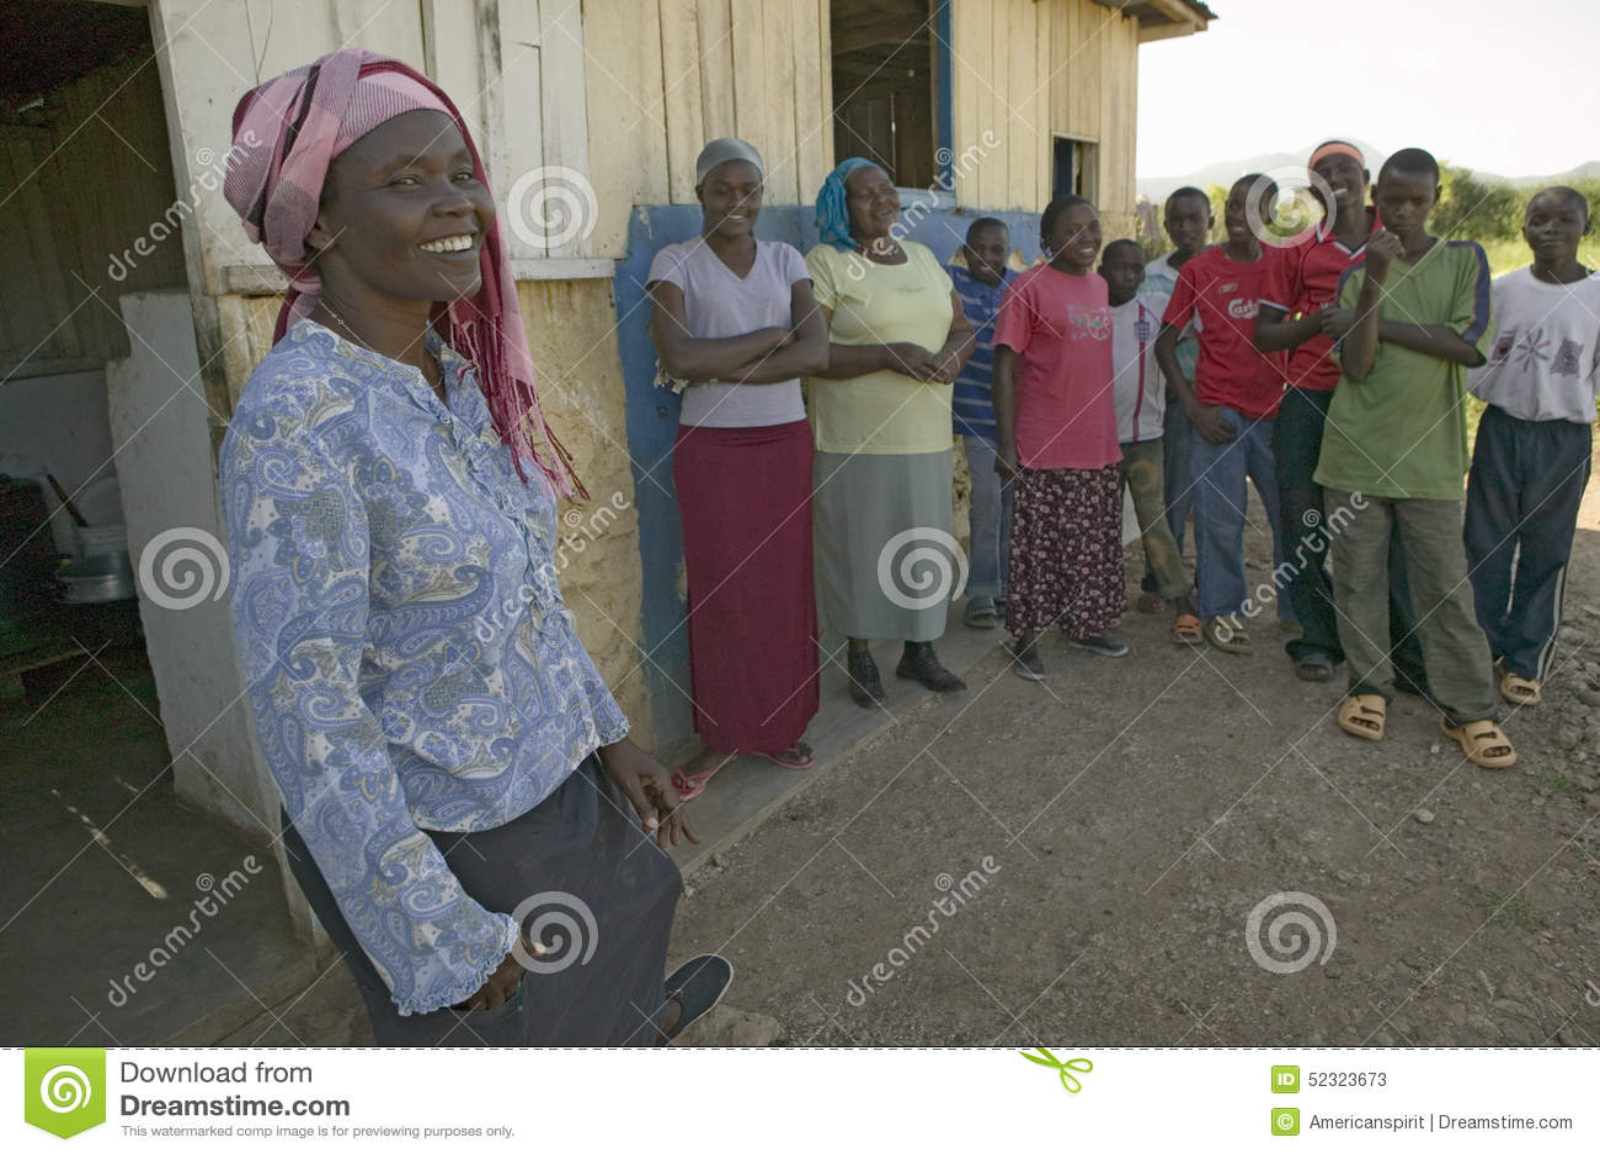 Khadija Rama, se tenant avec un groupe de personnes, est la fondatrice de Pepo La Tumaini Jangwani, réadaptation Progr de la Comm